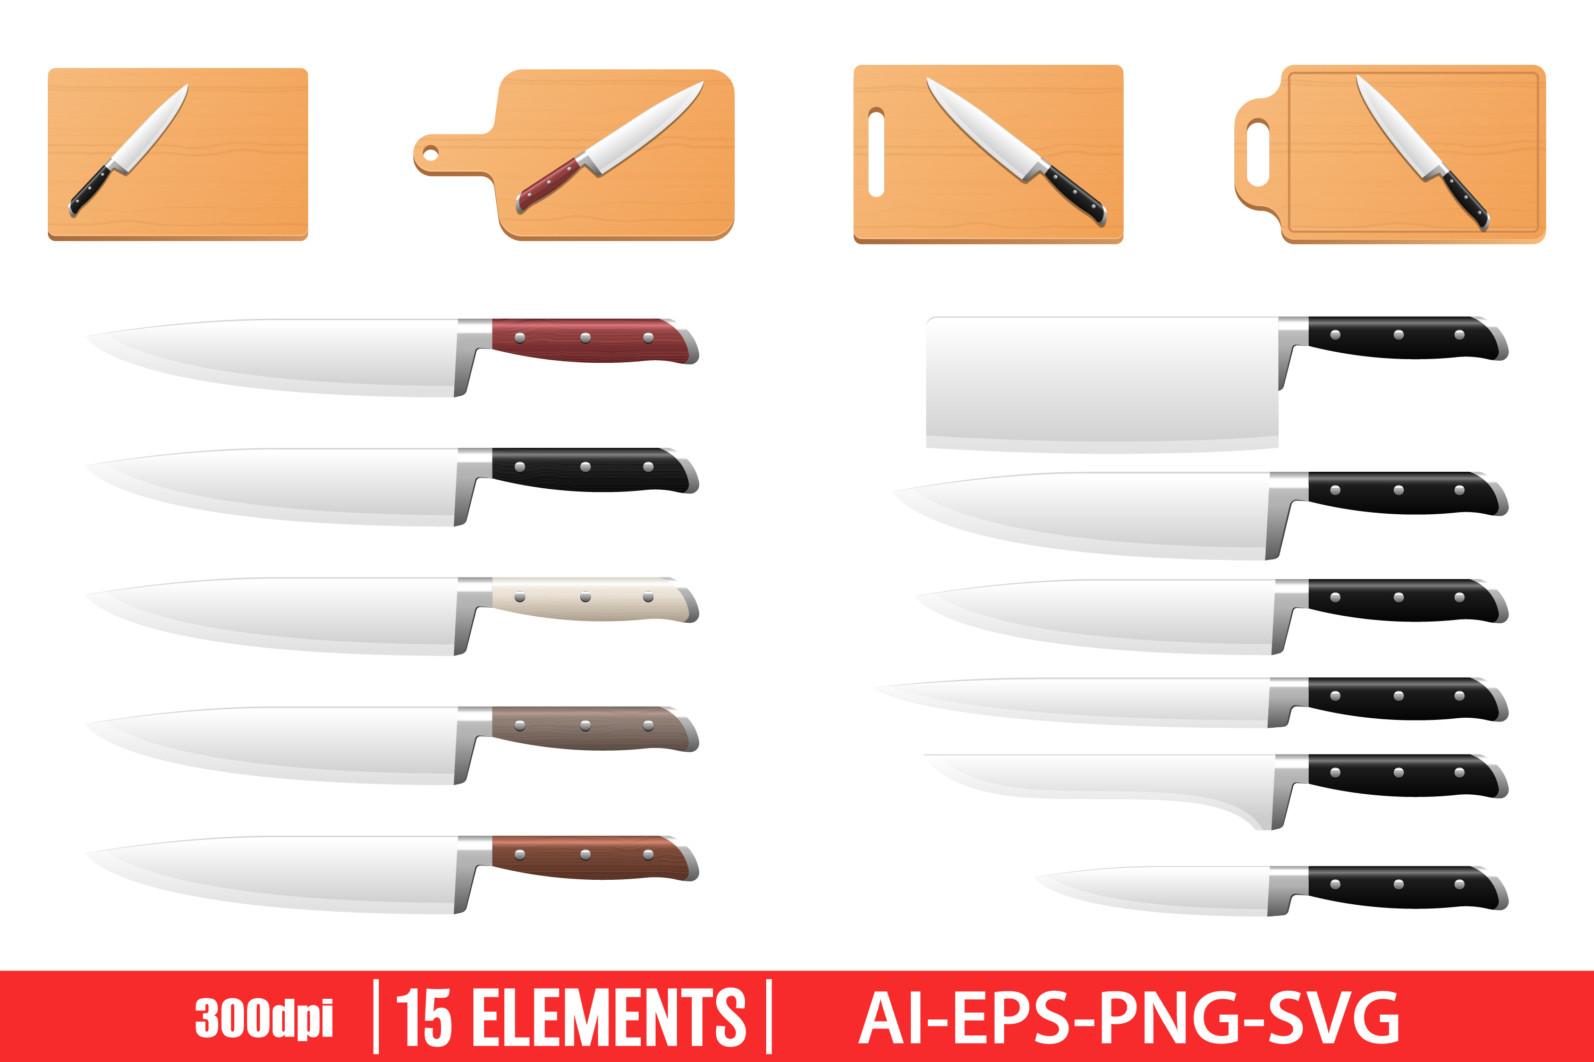 Kitchen knife clipart vector design illustration. Knife set. Vector Clipart Print - KNIFE scaled -